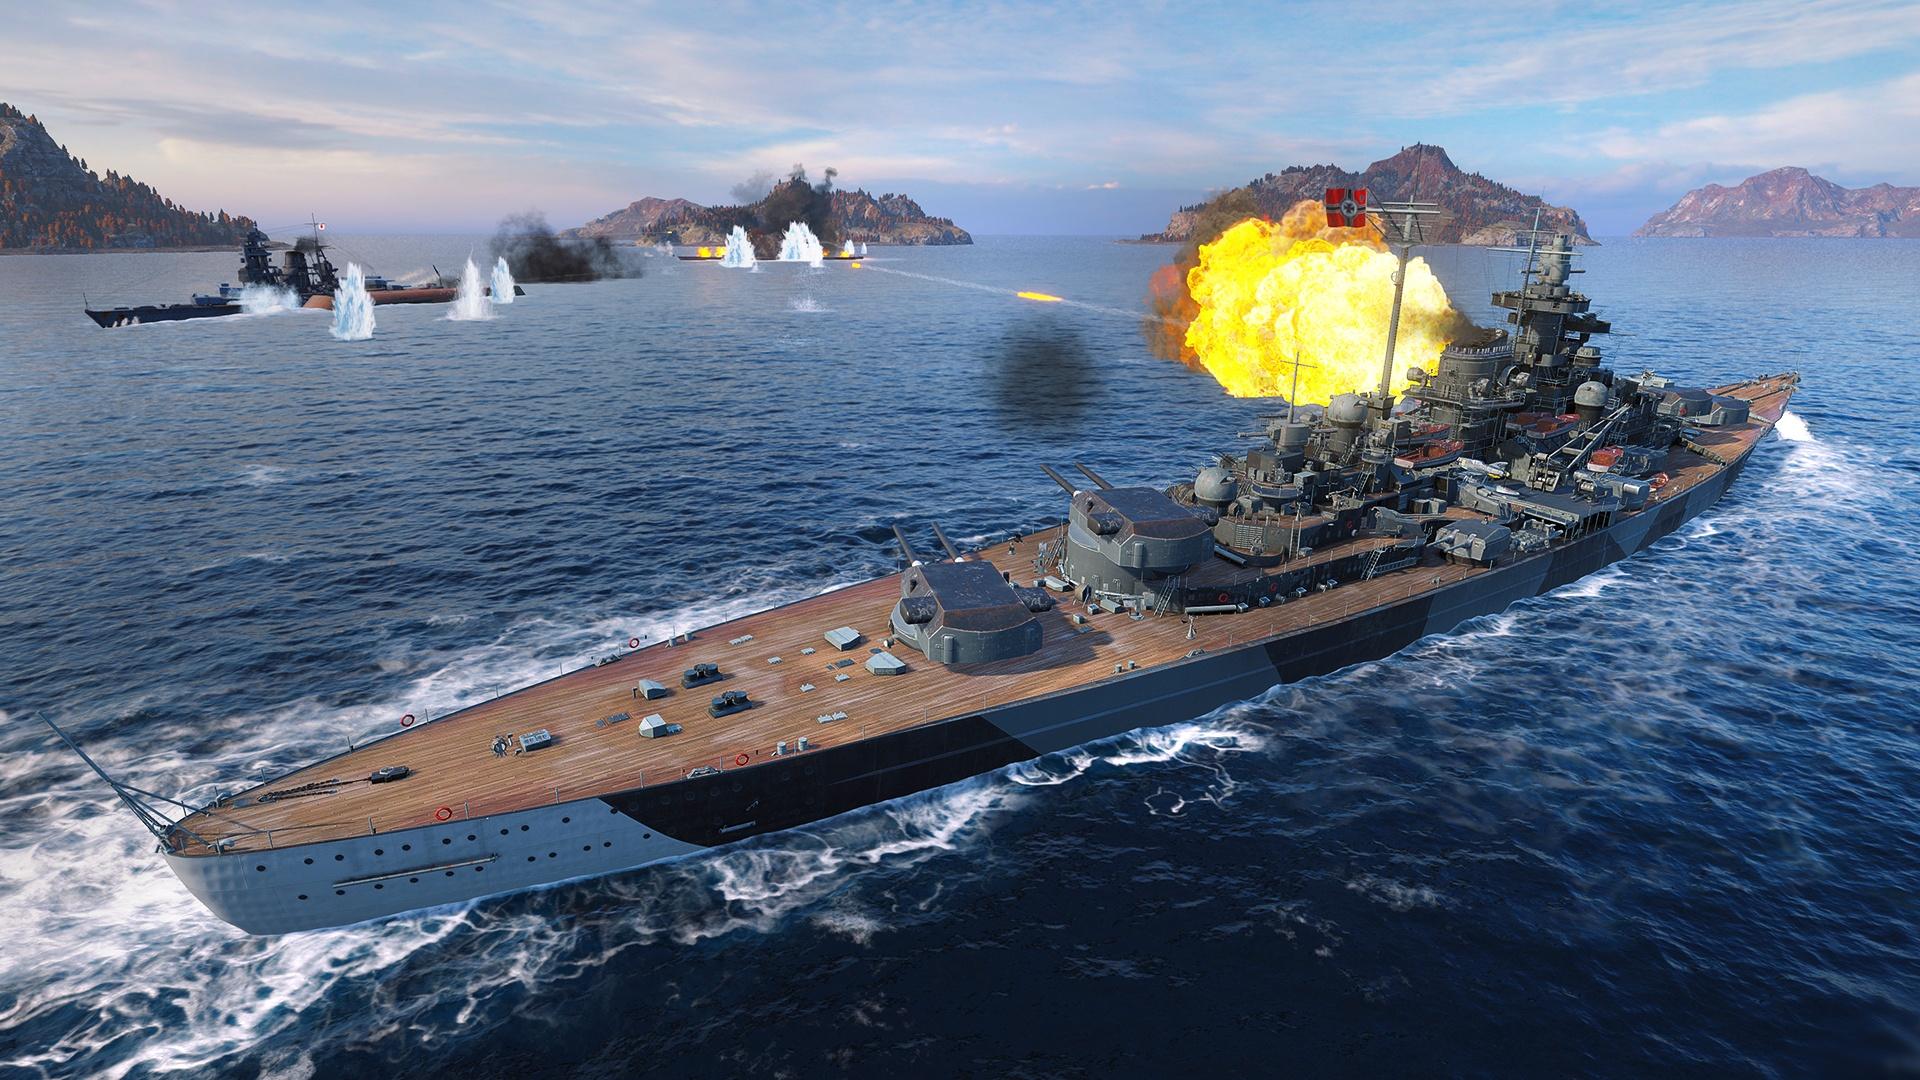 WoWSL_noLogo_noUI_EN_AugustRelease_Tirpitz10_1920x1080.jpg